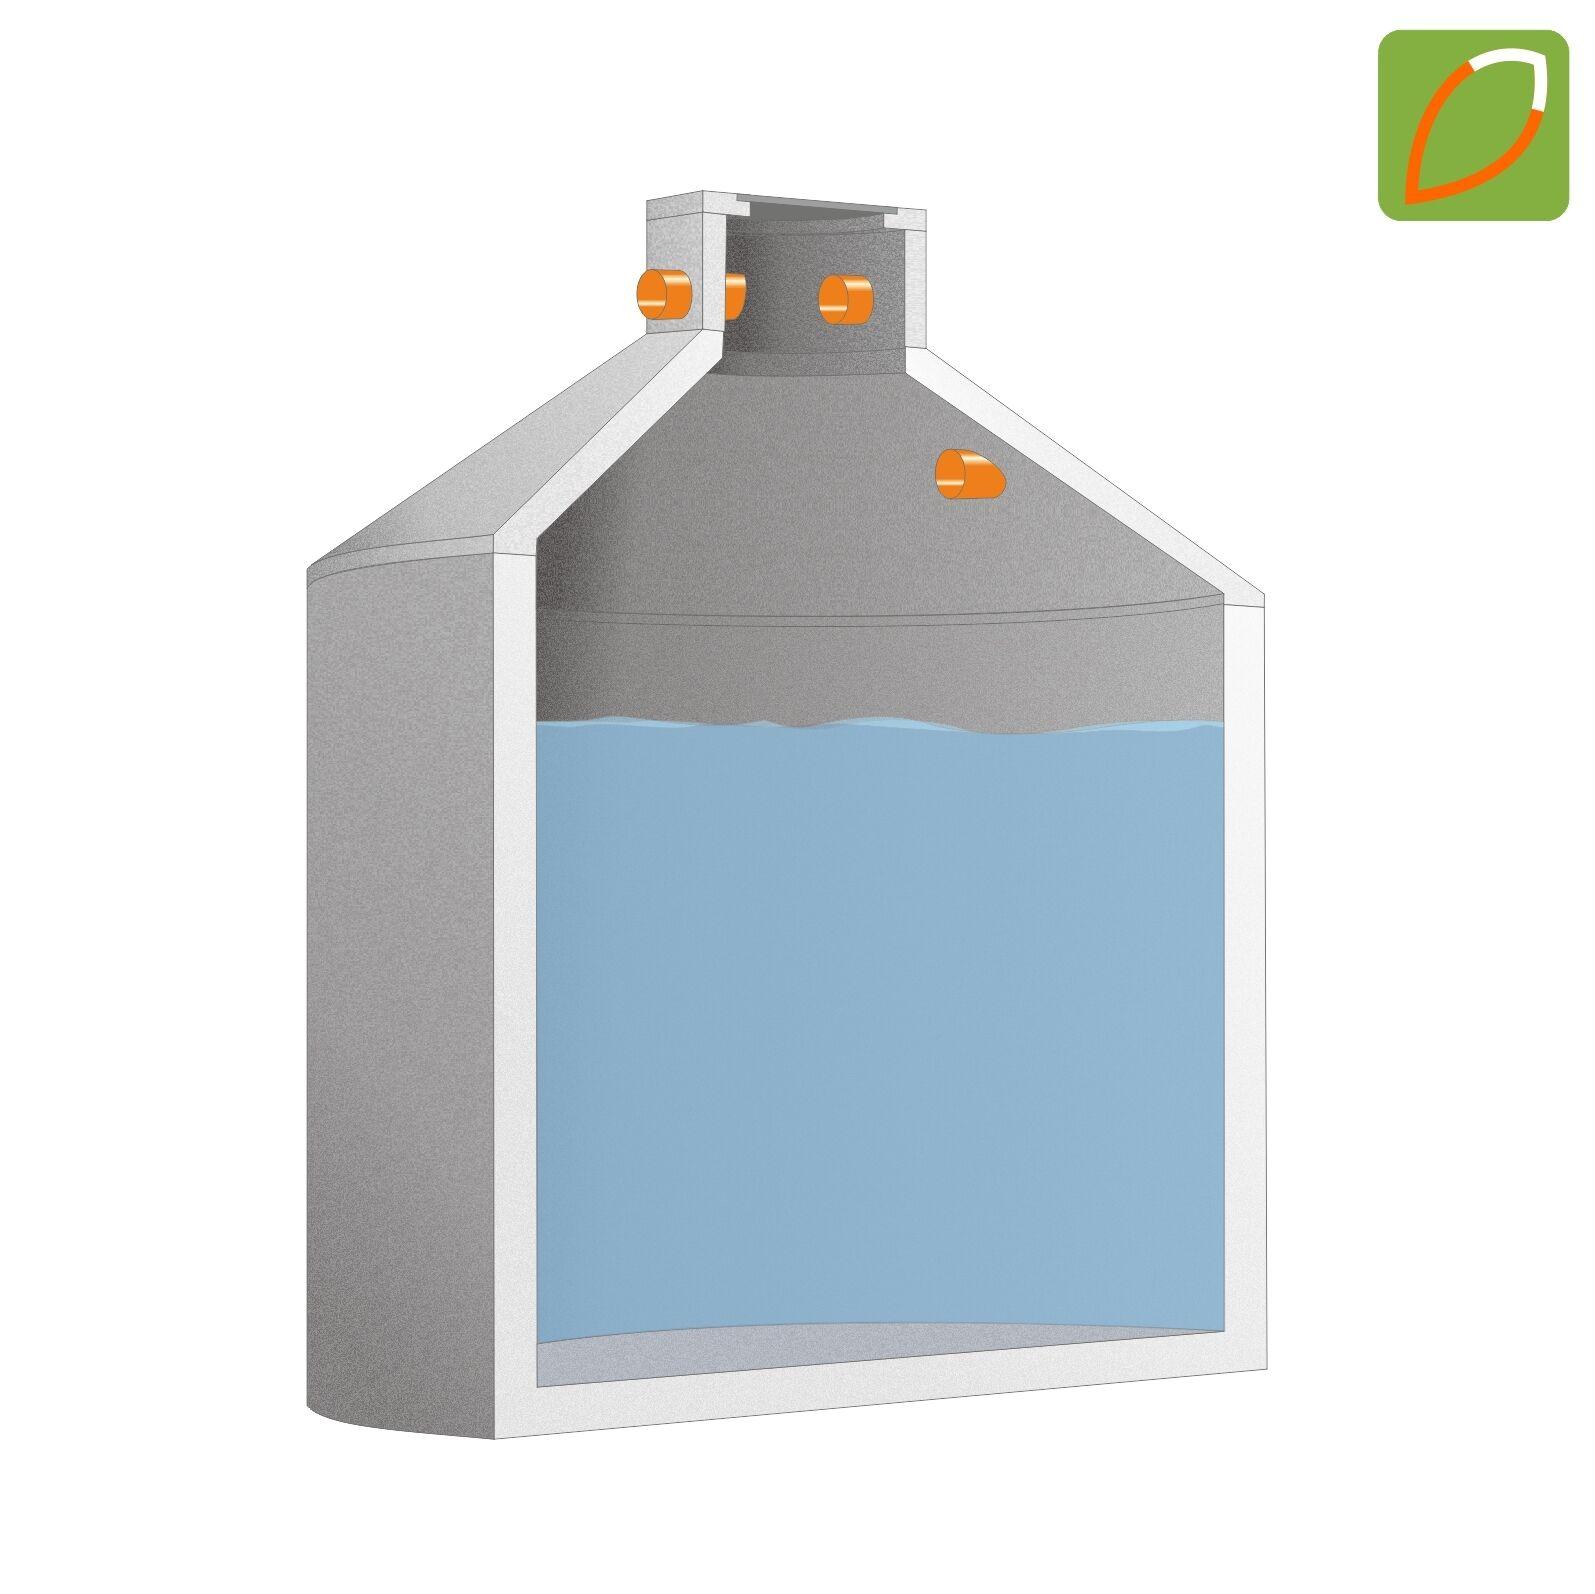 AquaGRANDE Betonzisterne 3.400 - 10.600 l Zisterne Erdtank Regenspeicher Tank